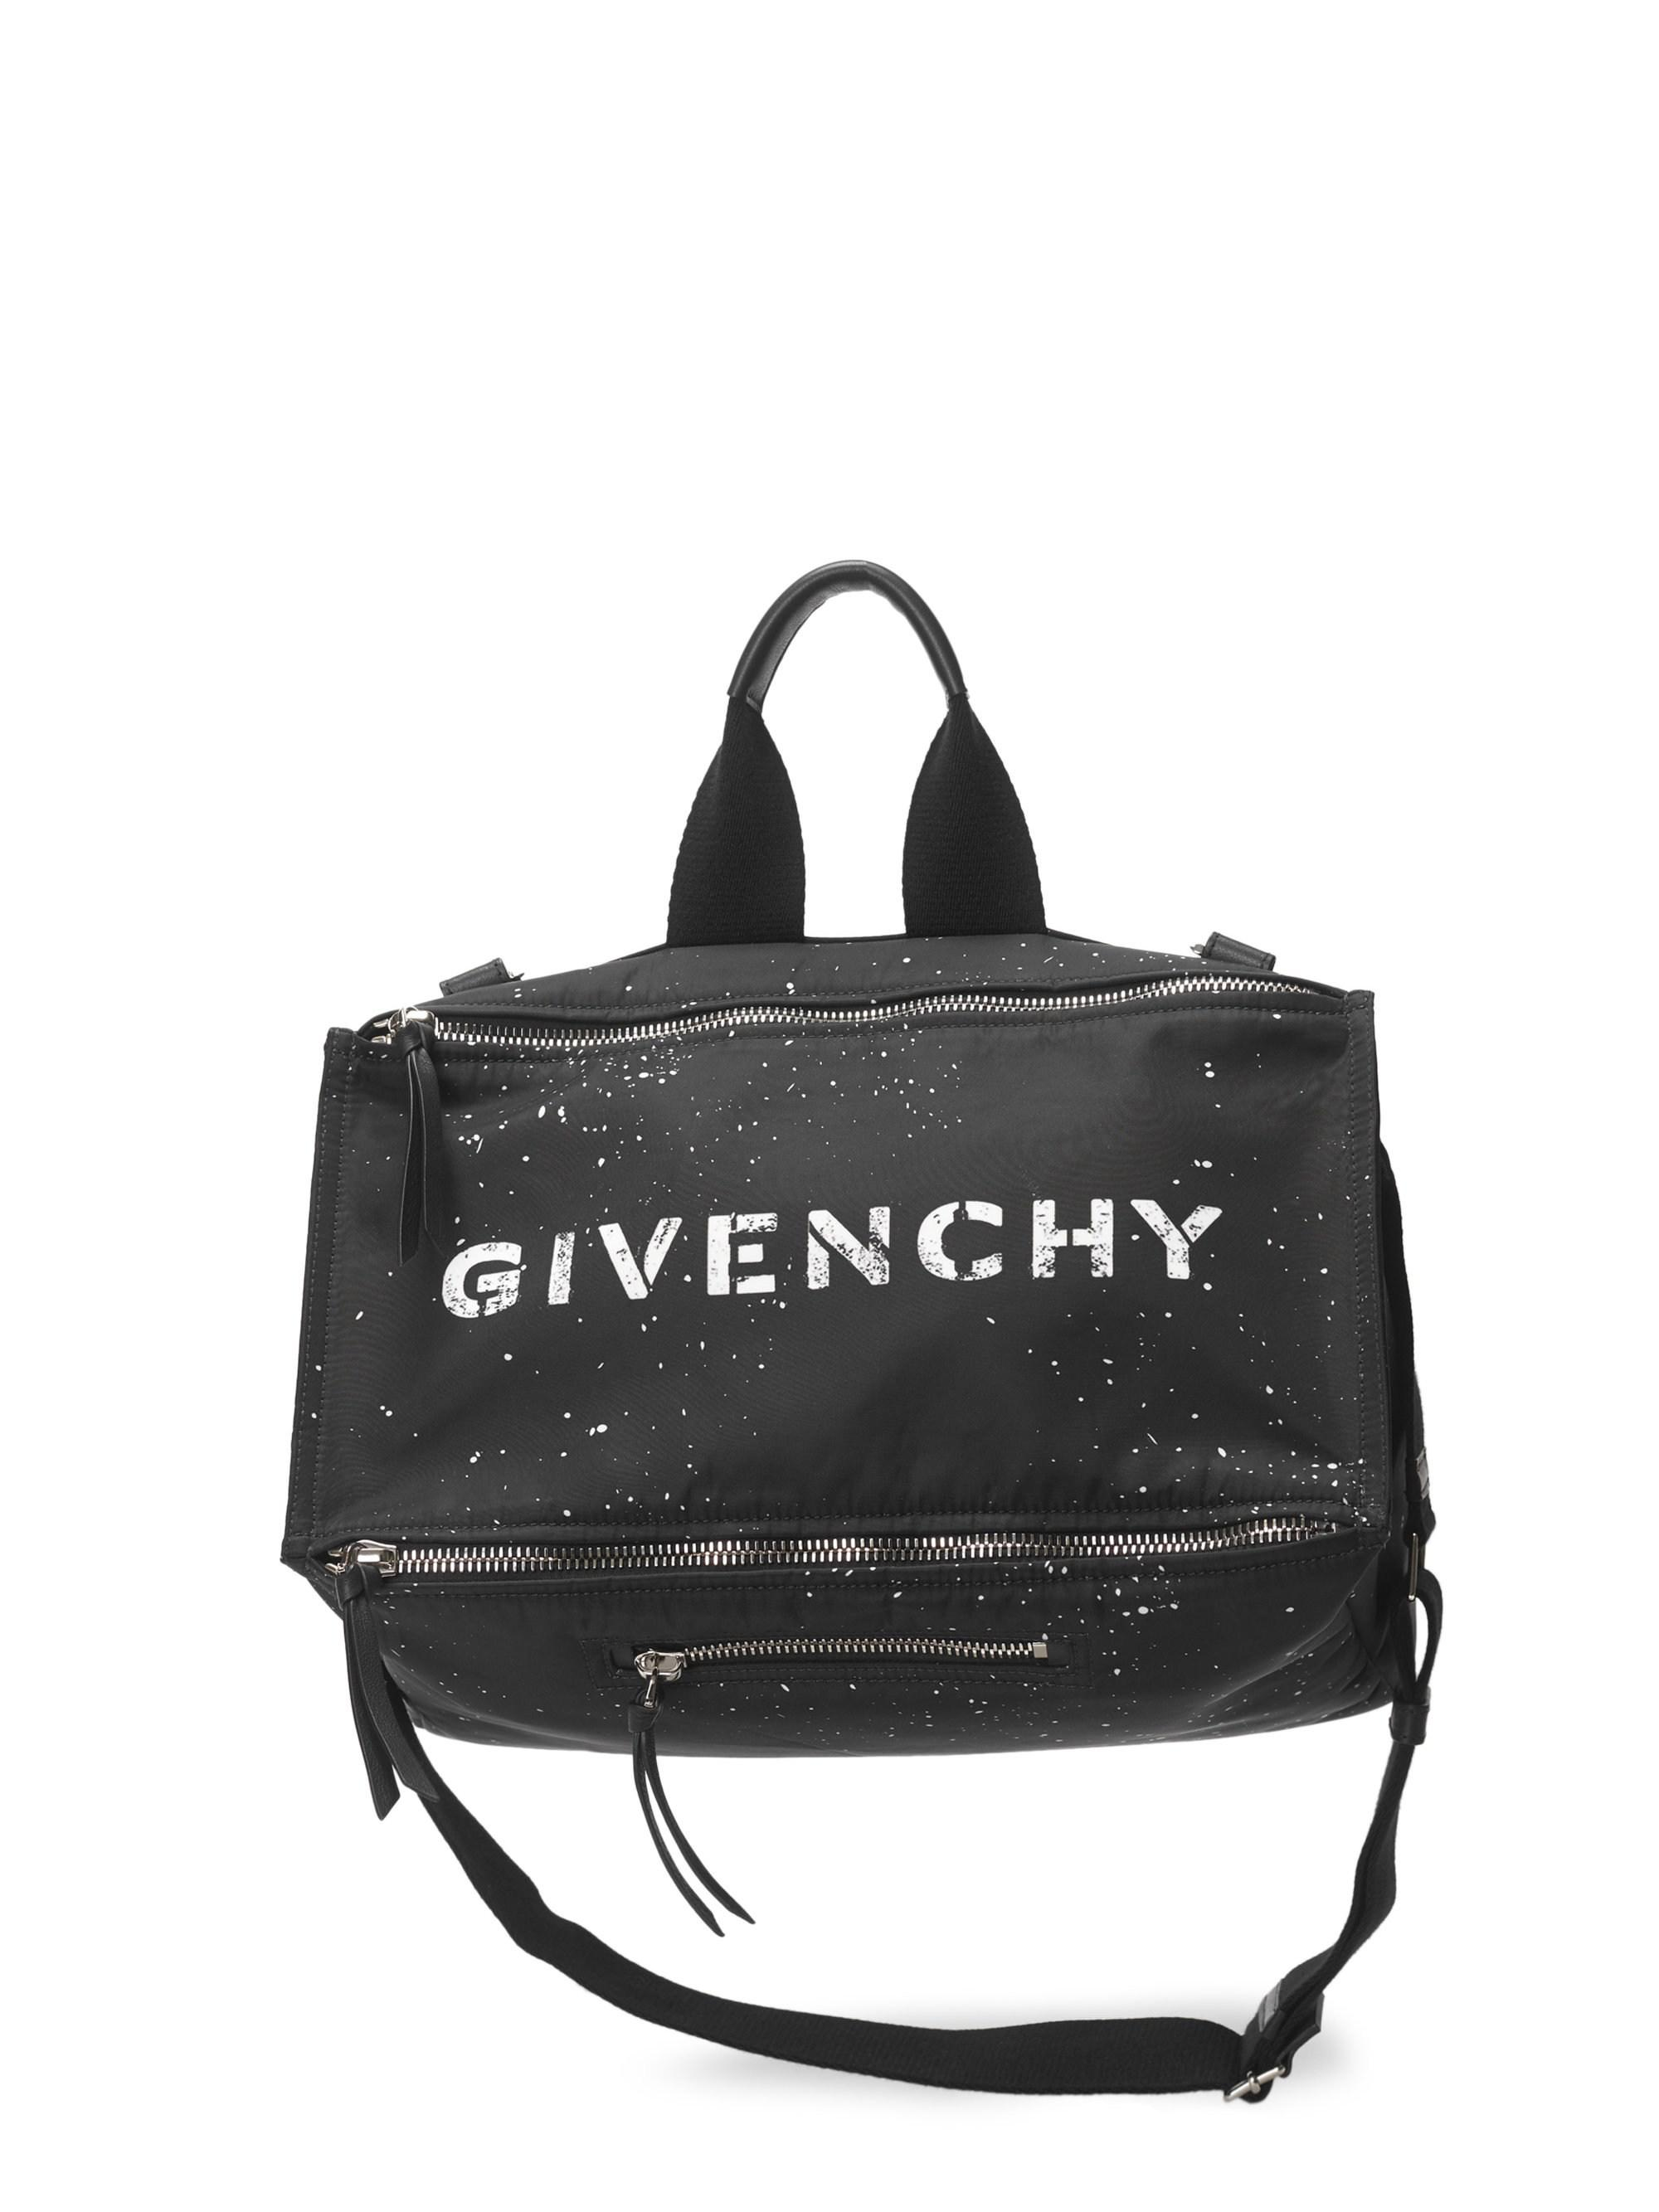 8c11d983b6 Givenchy - Black Pandora Messenger Bag for Men - Lyst. View fullscreen